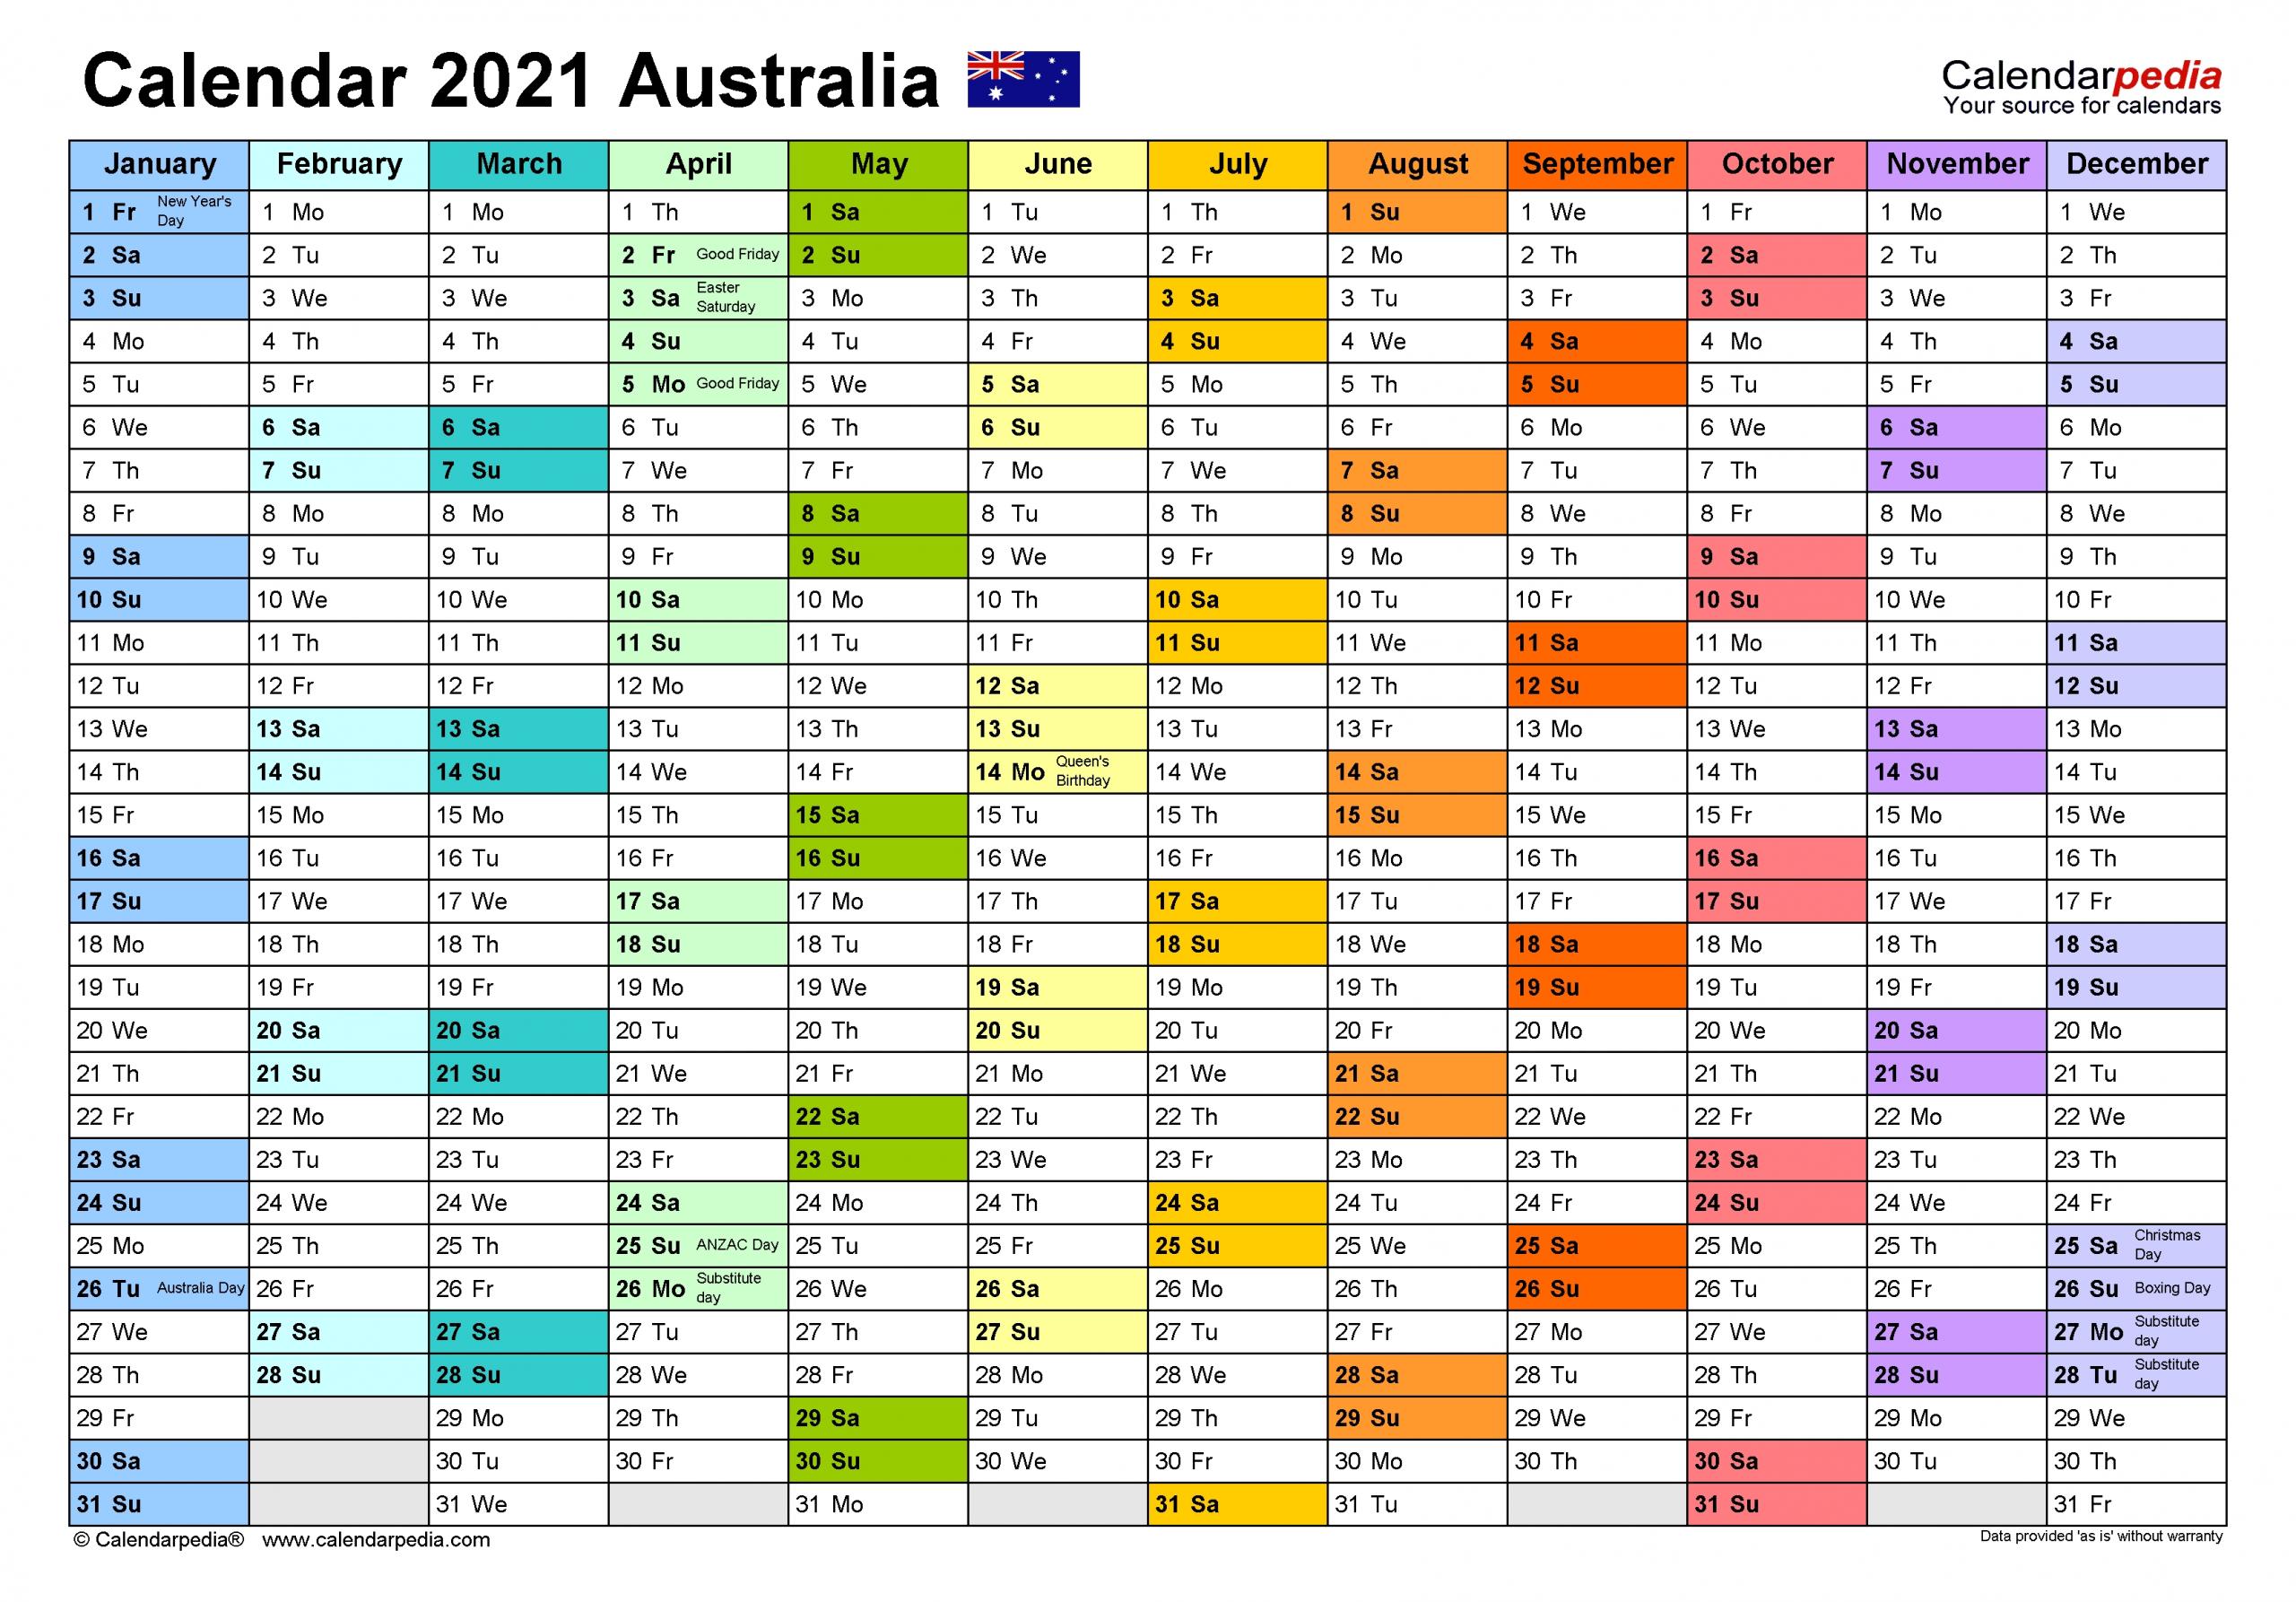 Australia Calendar 2021 - Free Printable Excel Templates  2021 Financial Year Dates Australia